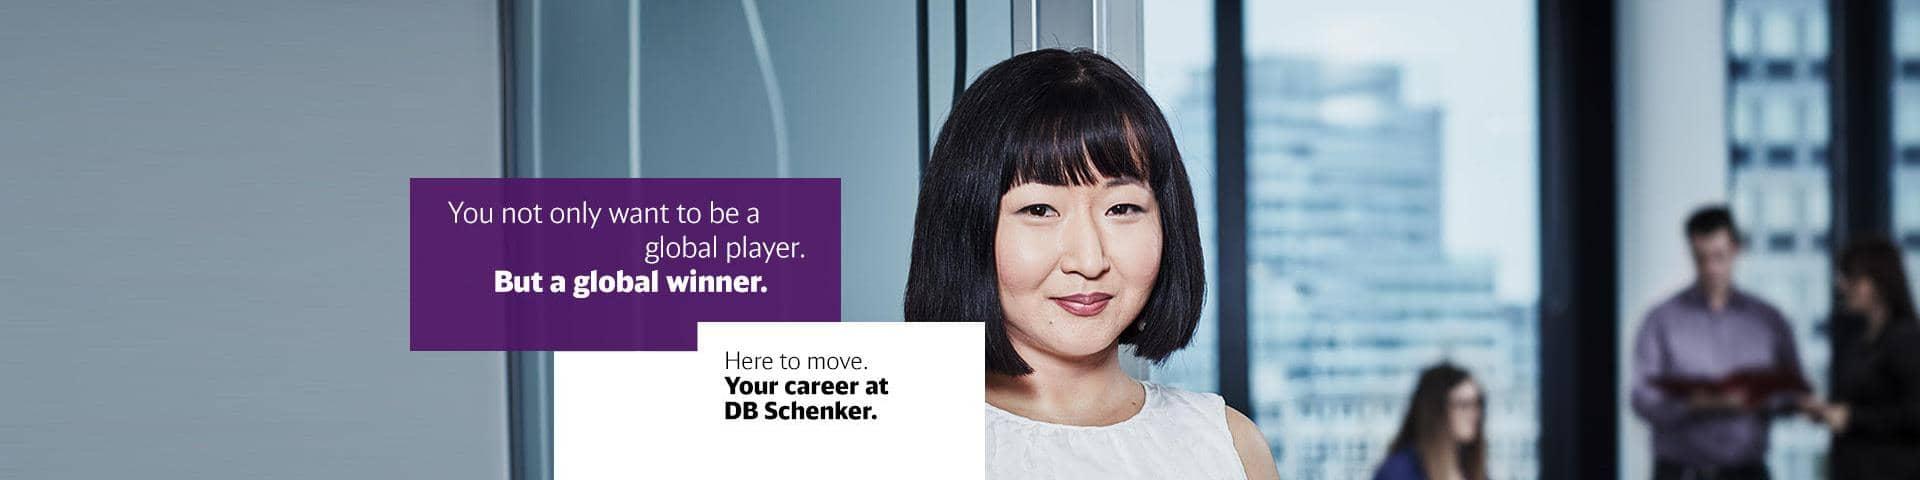 Career at DB Schenker